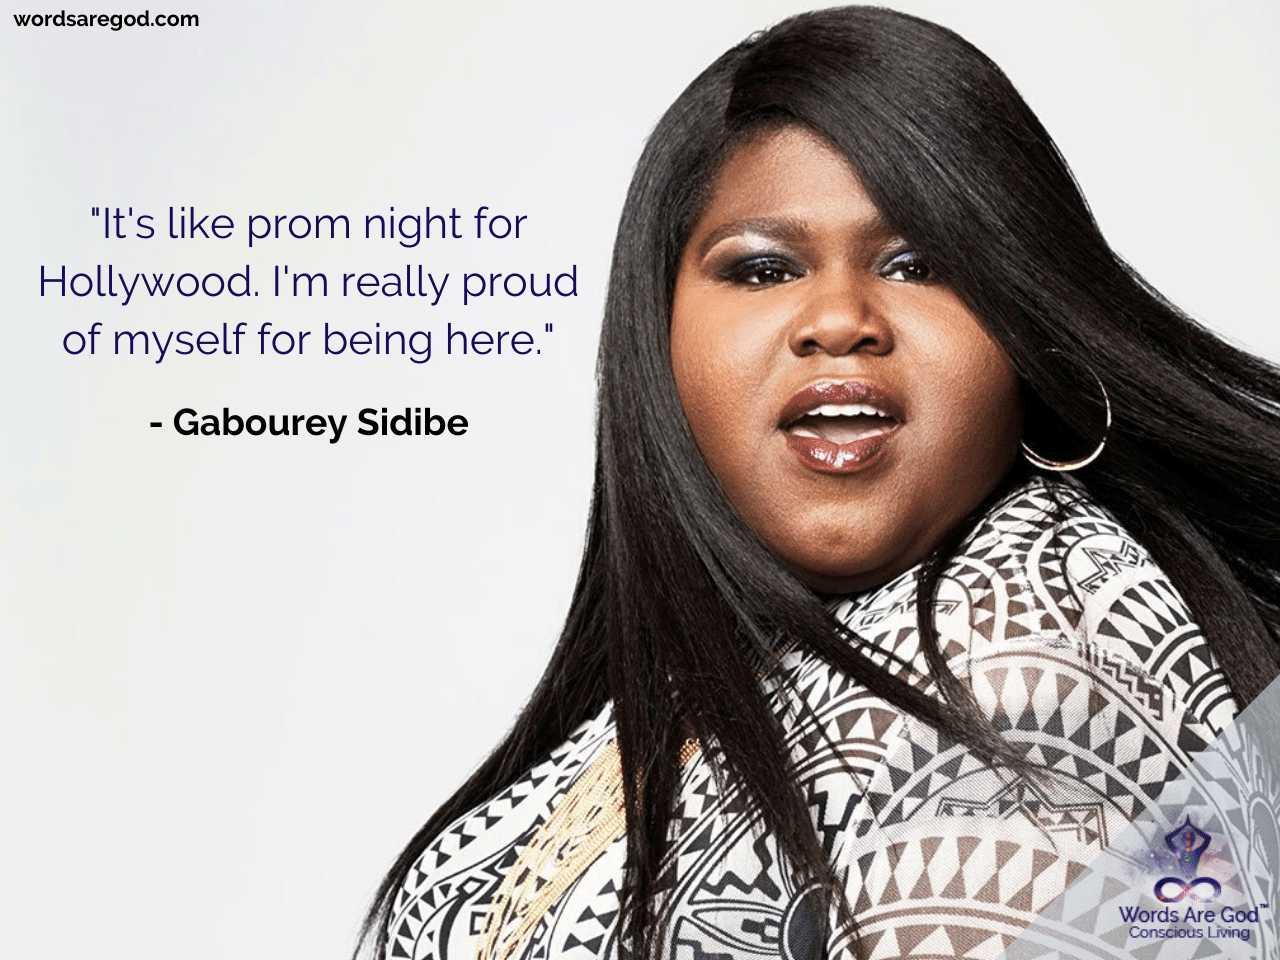 Gabourey Sidibe Inspirational Quote by Gabourey Sidibe